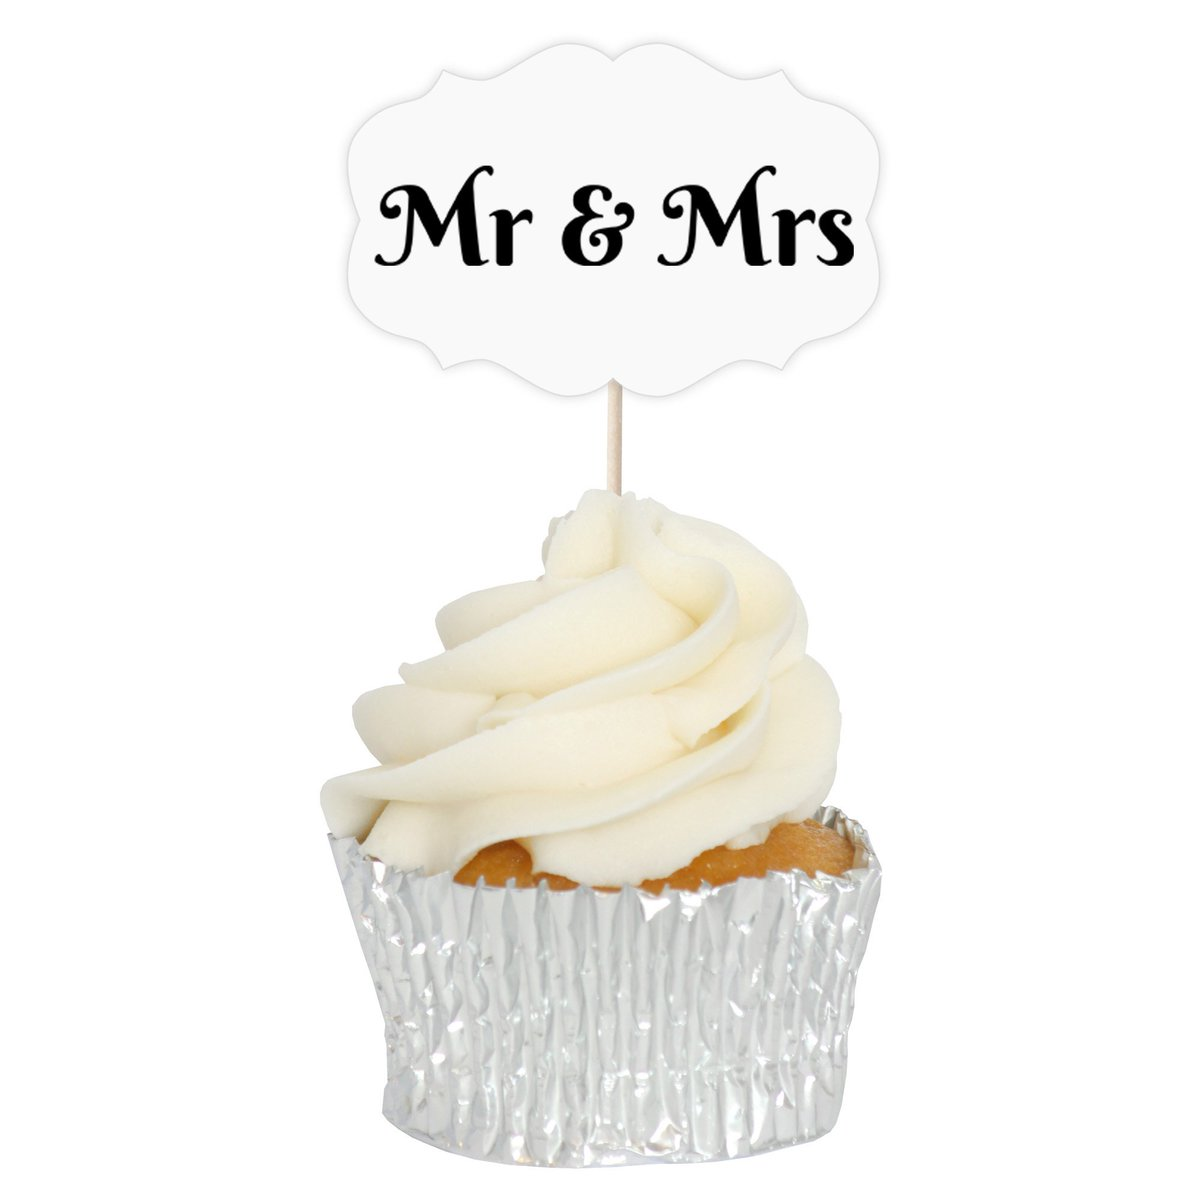 Almond Art On Twitter Mr Mrs Wedding Cupcake Toppers 12pk